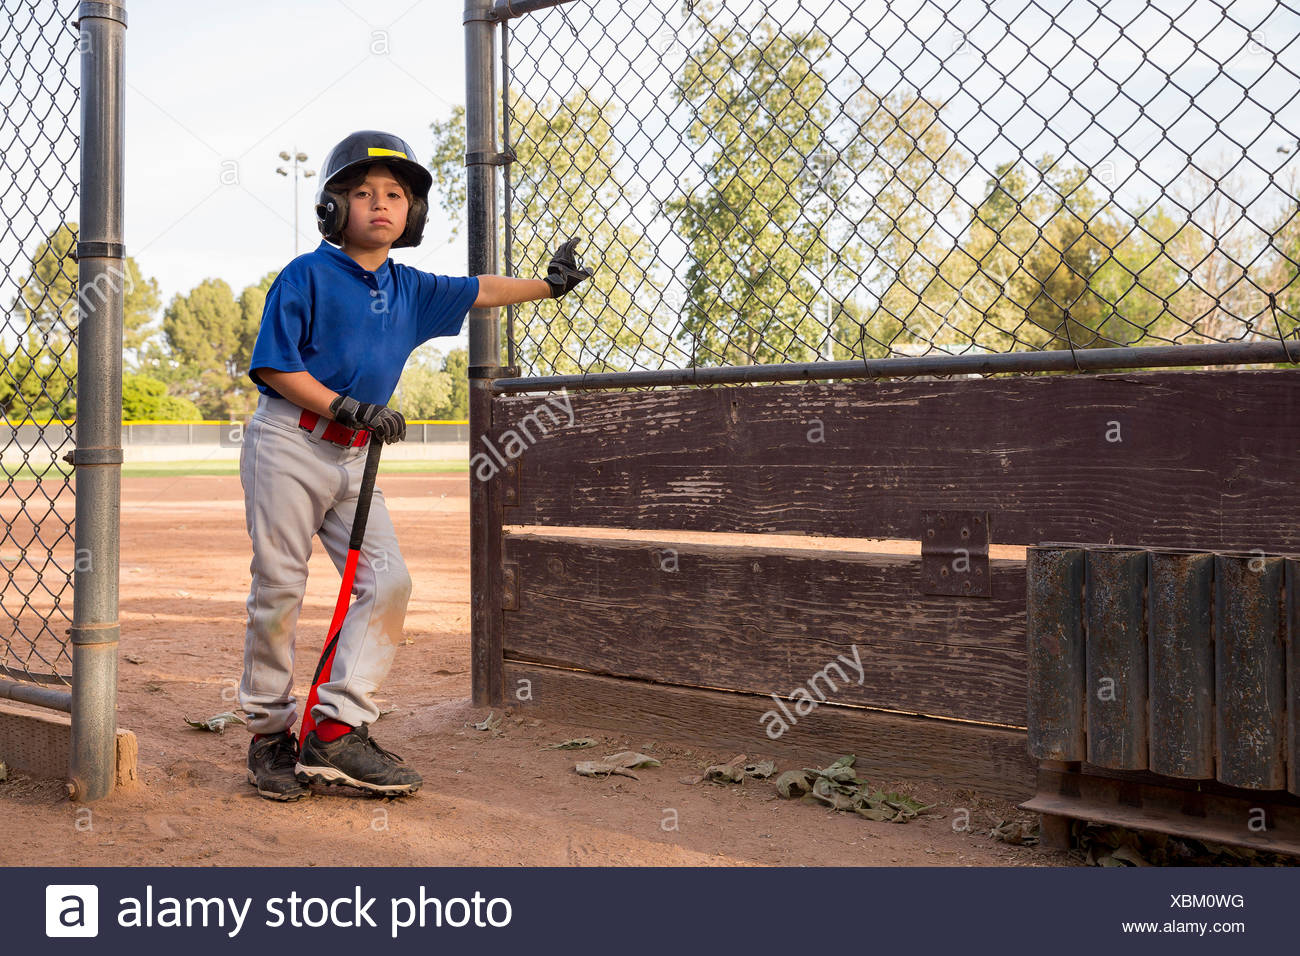 Portrait of boy with baseball bat leaning against fence at baseball practise - Stock Image